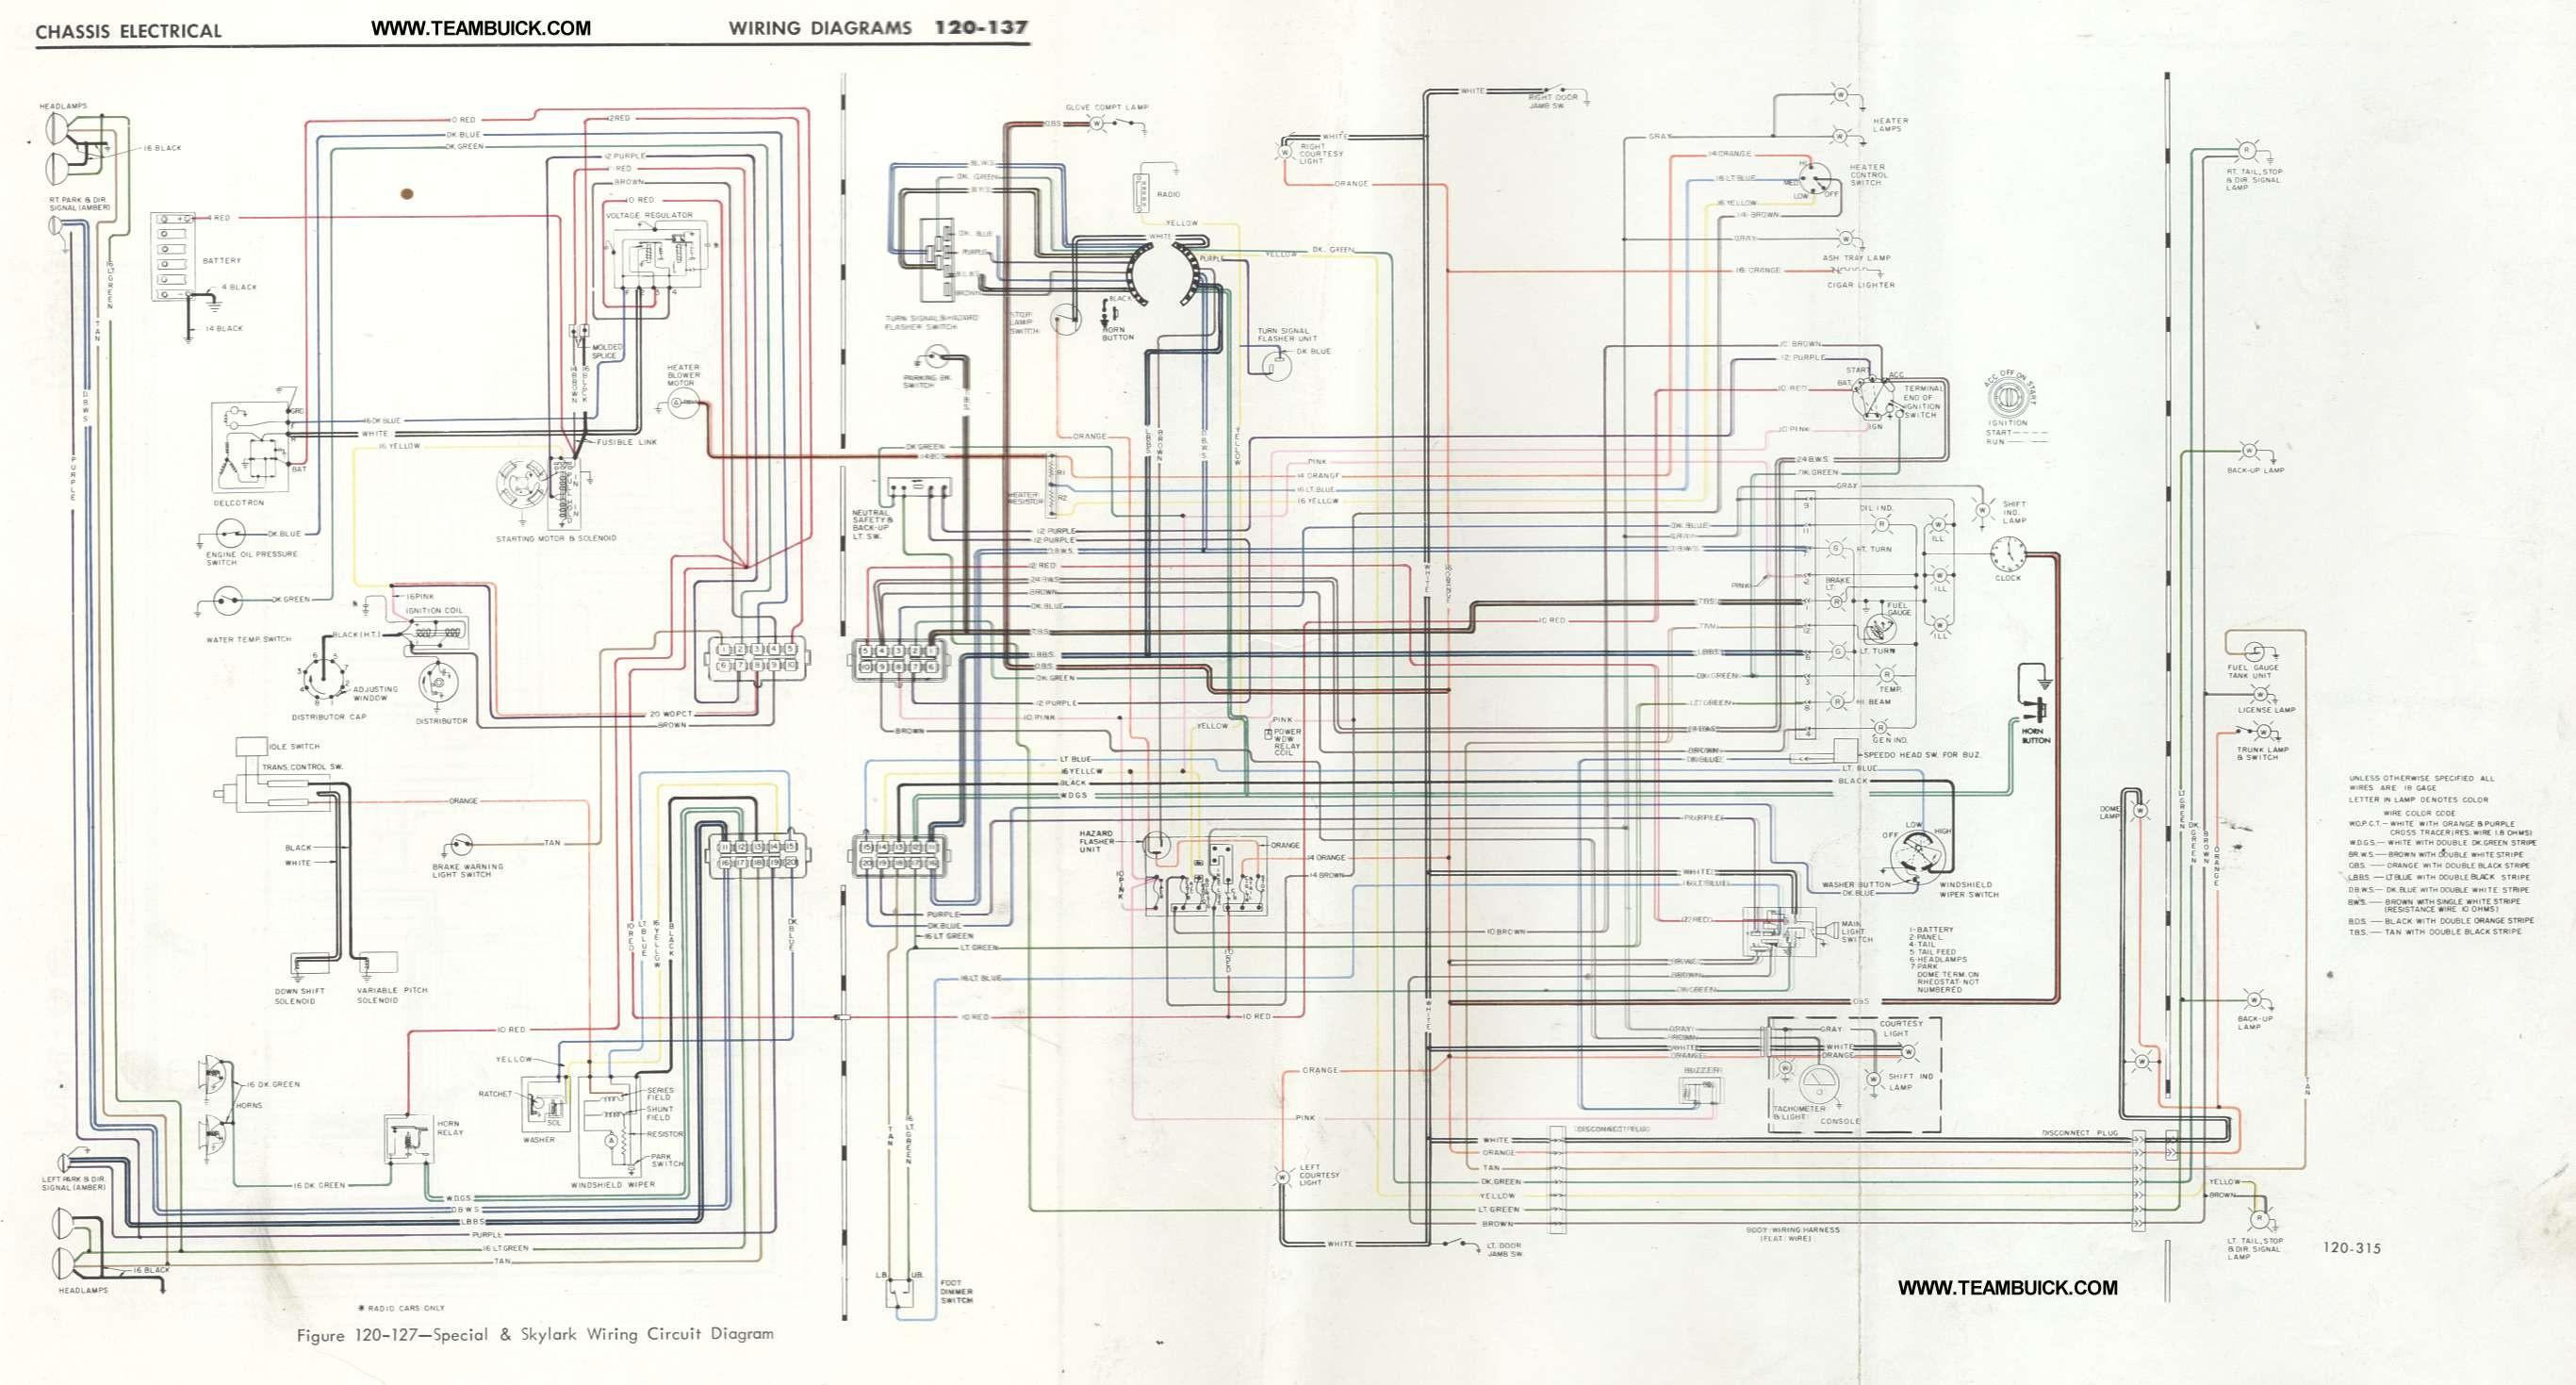 2003 Buick Century Engine Diagram Buick Wiring Diagram Schema Wiring Diagram Of 2003 Buick Century Engine Diagram